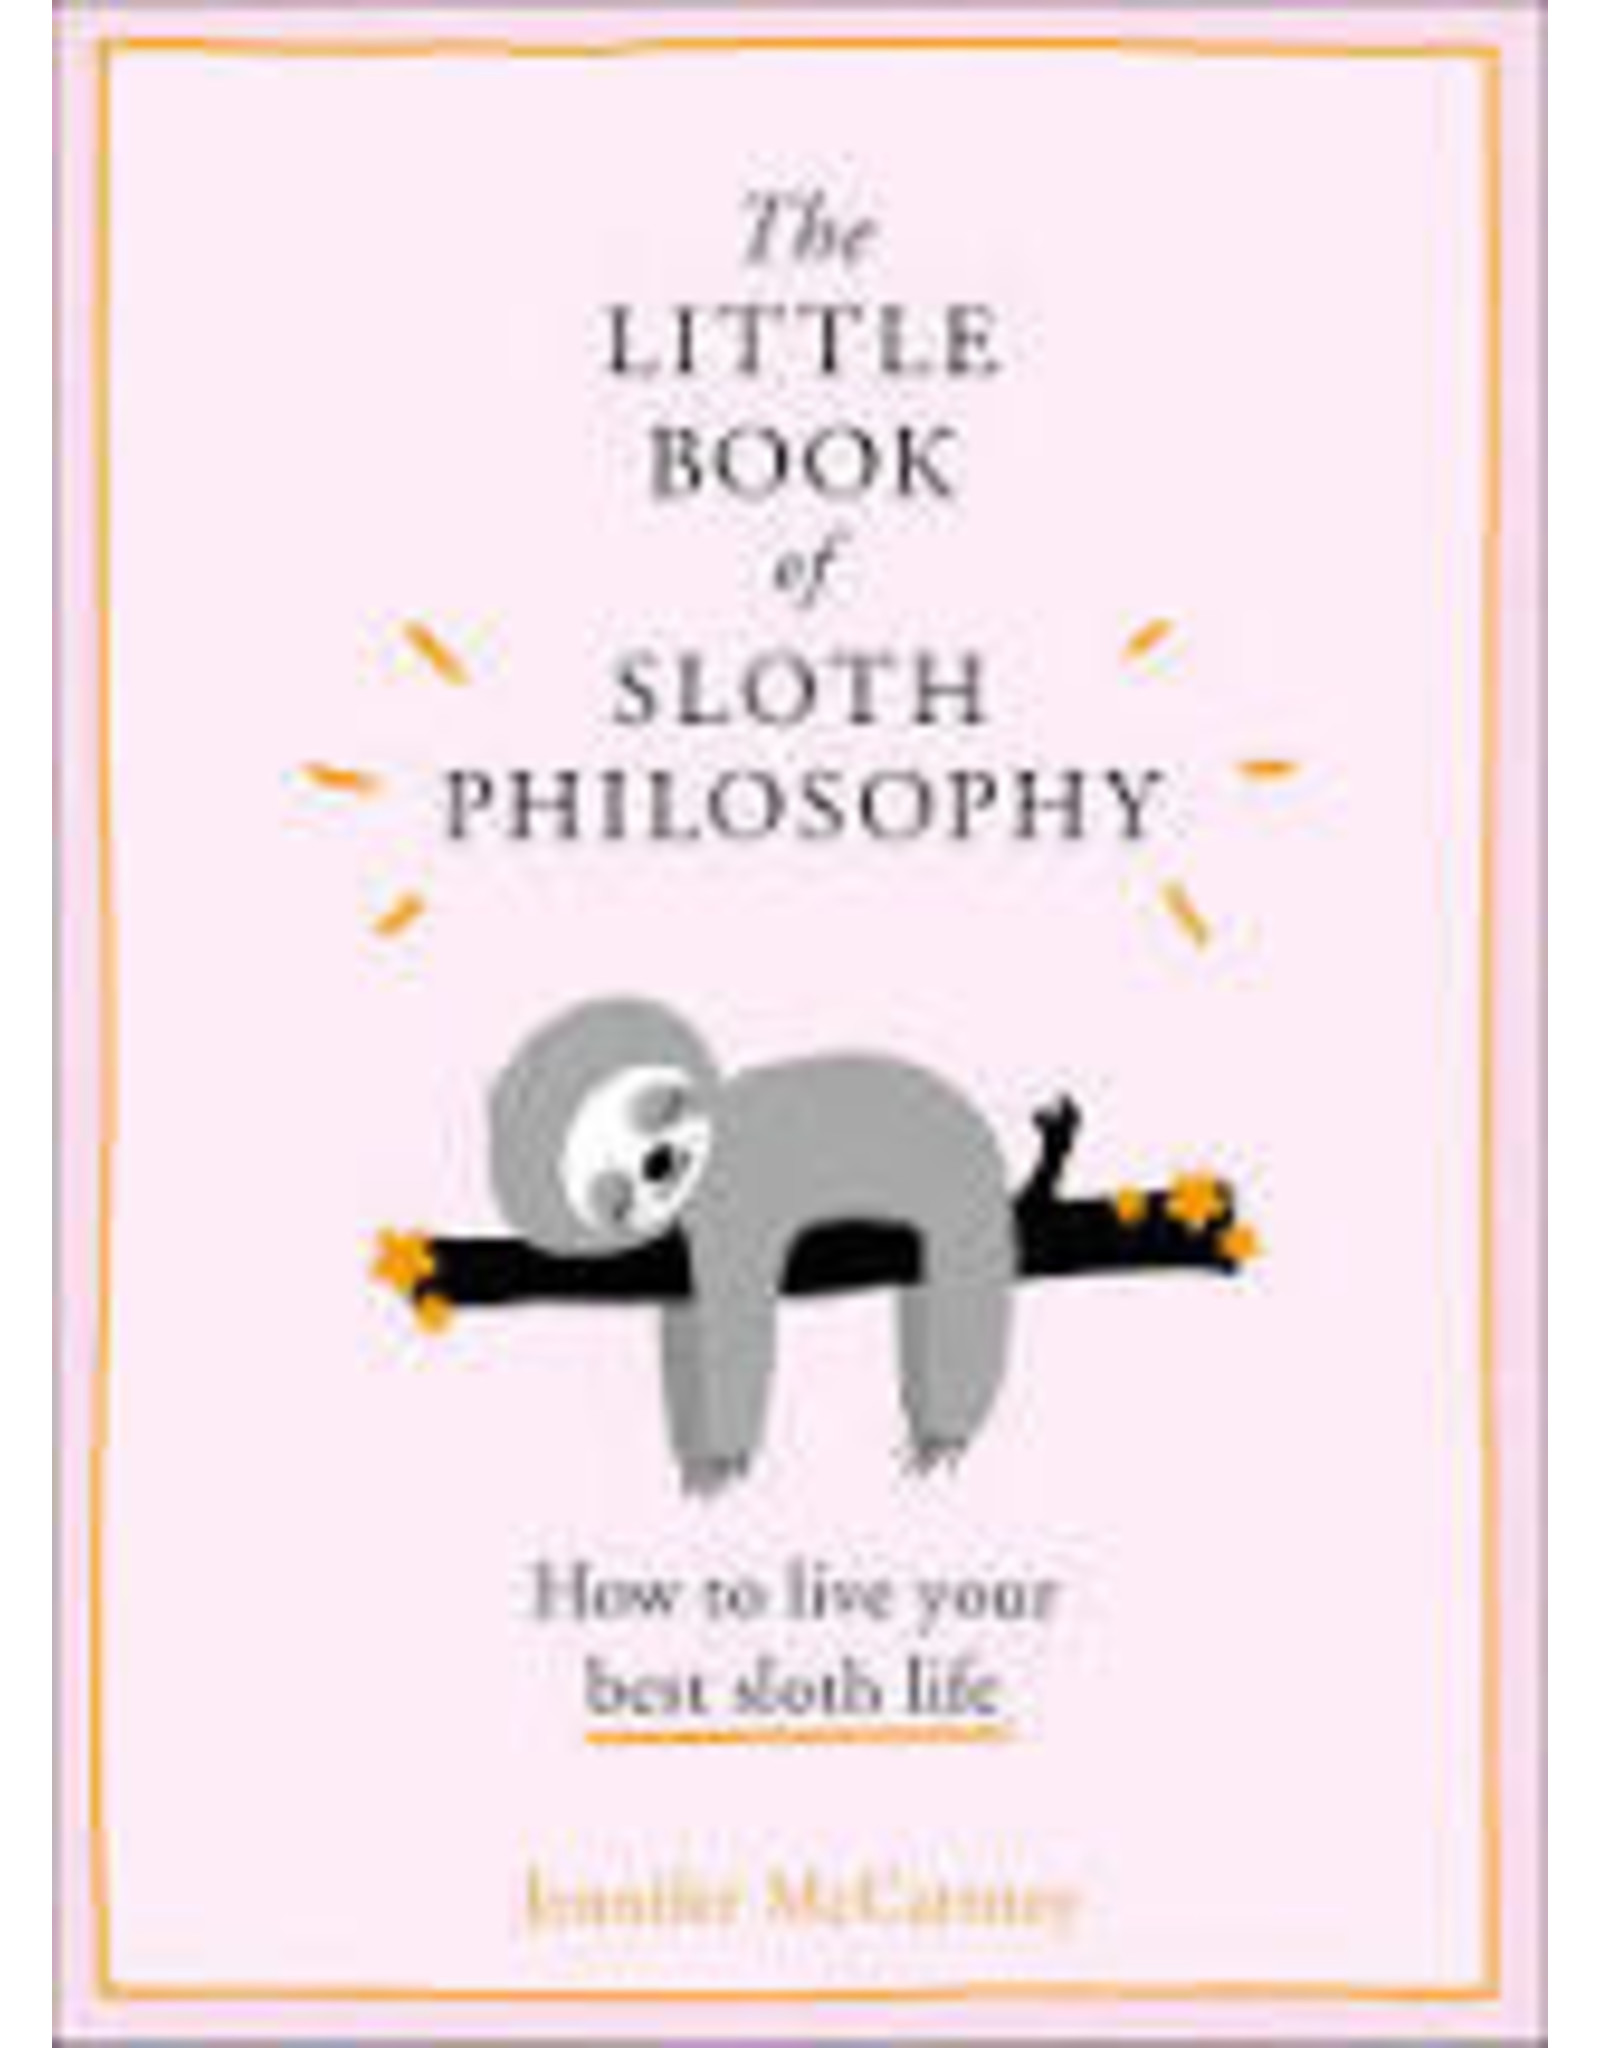 Books The Little Book of Sloth Philosophy by Jennifer McCartney